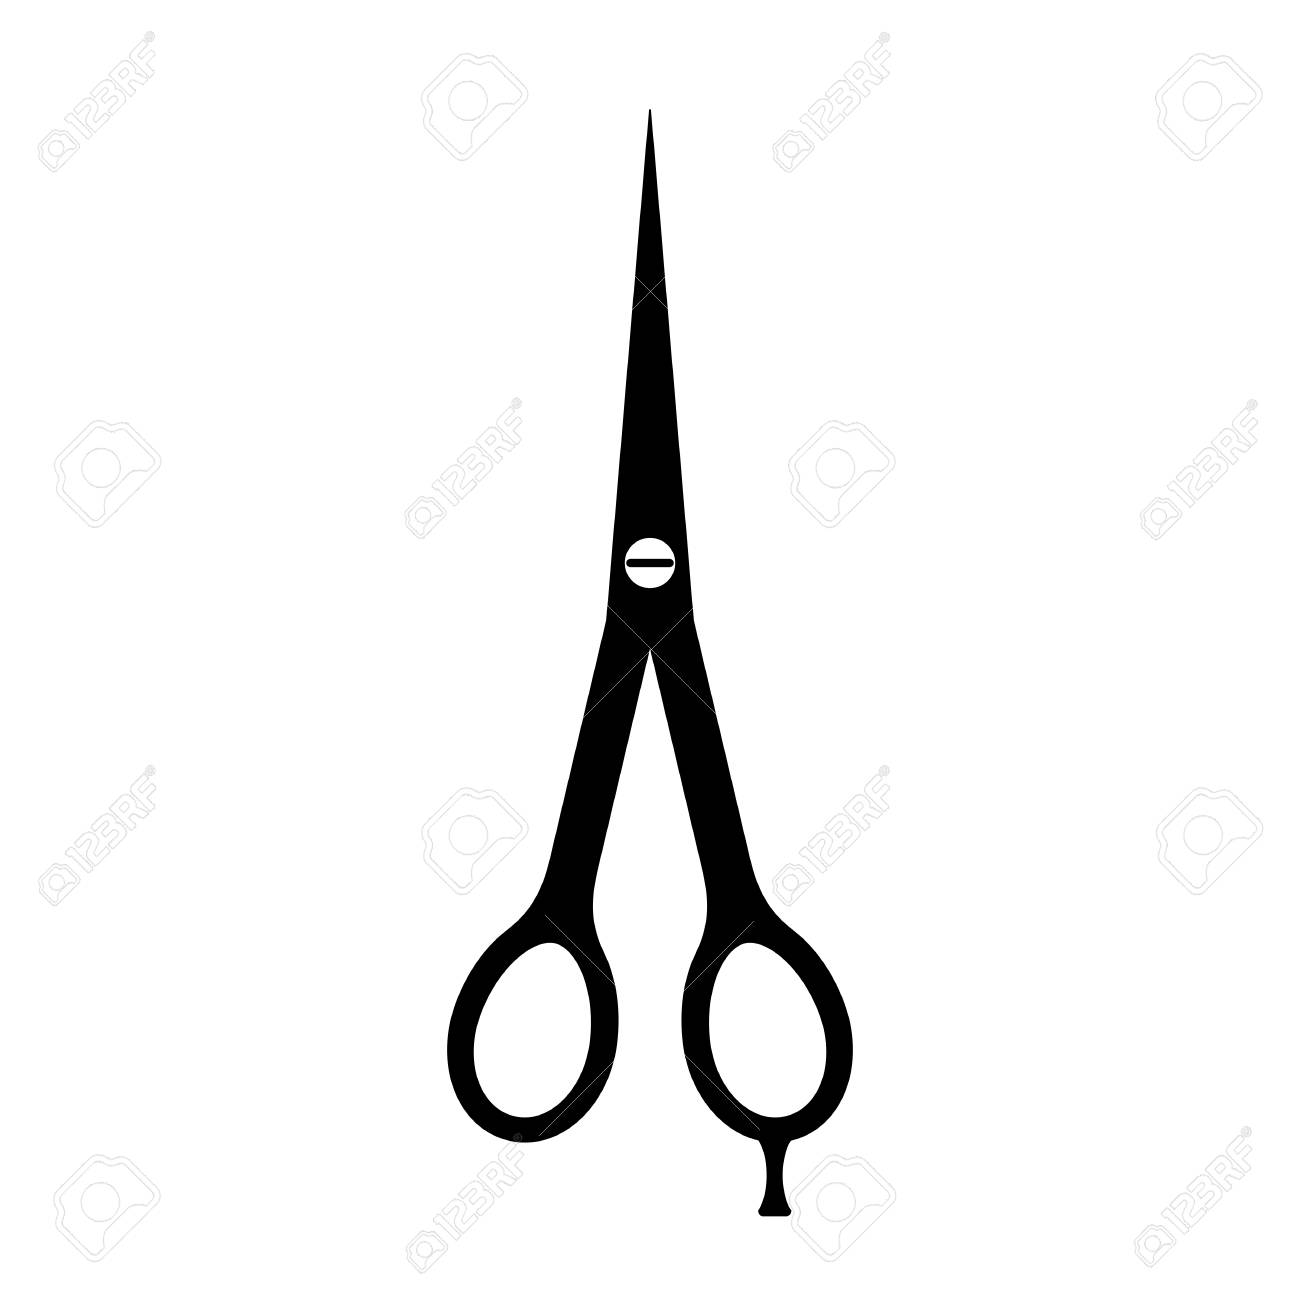 Dünne Friseur Schere Vektor Symbol Lizenzfrei Nutzbare